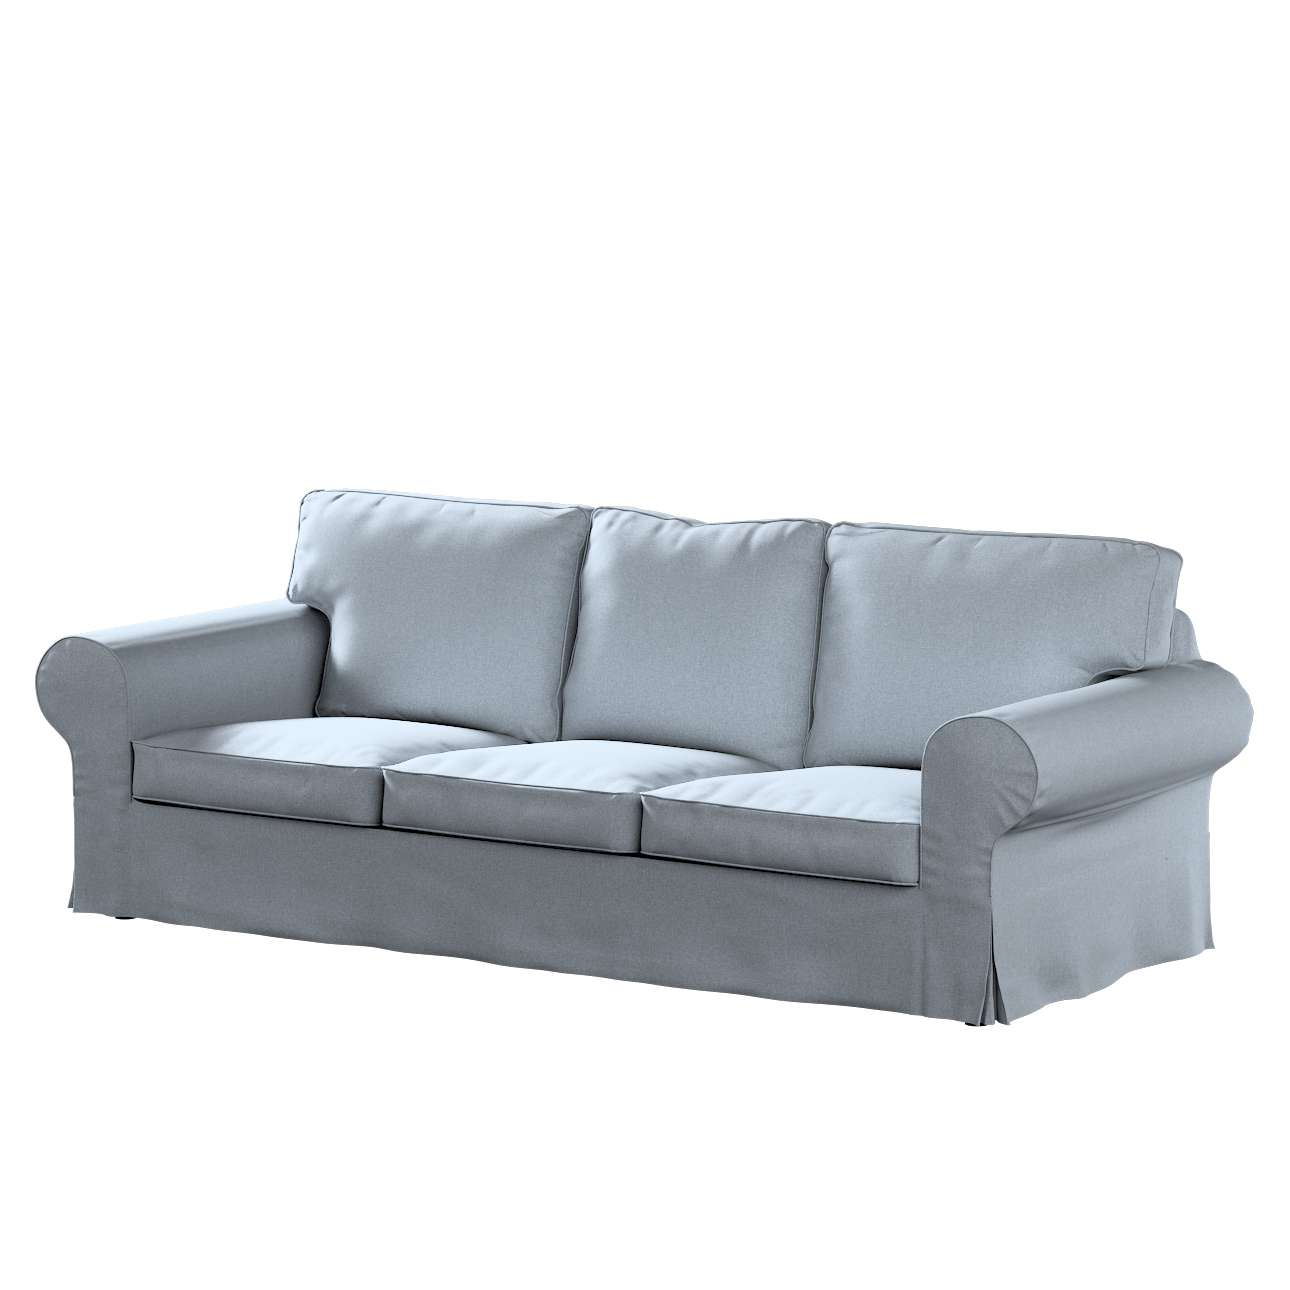 Farlov 3 seater sofa cover set includes 6 pieces: Ektorp 3-seater sofa cover, blue blend, 704-46, Ektorp 3 ...